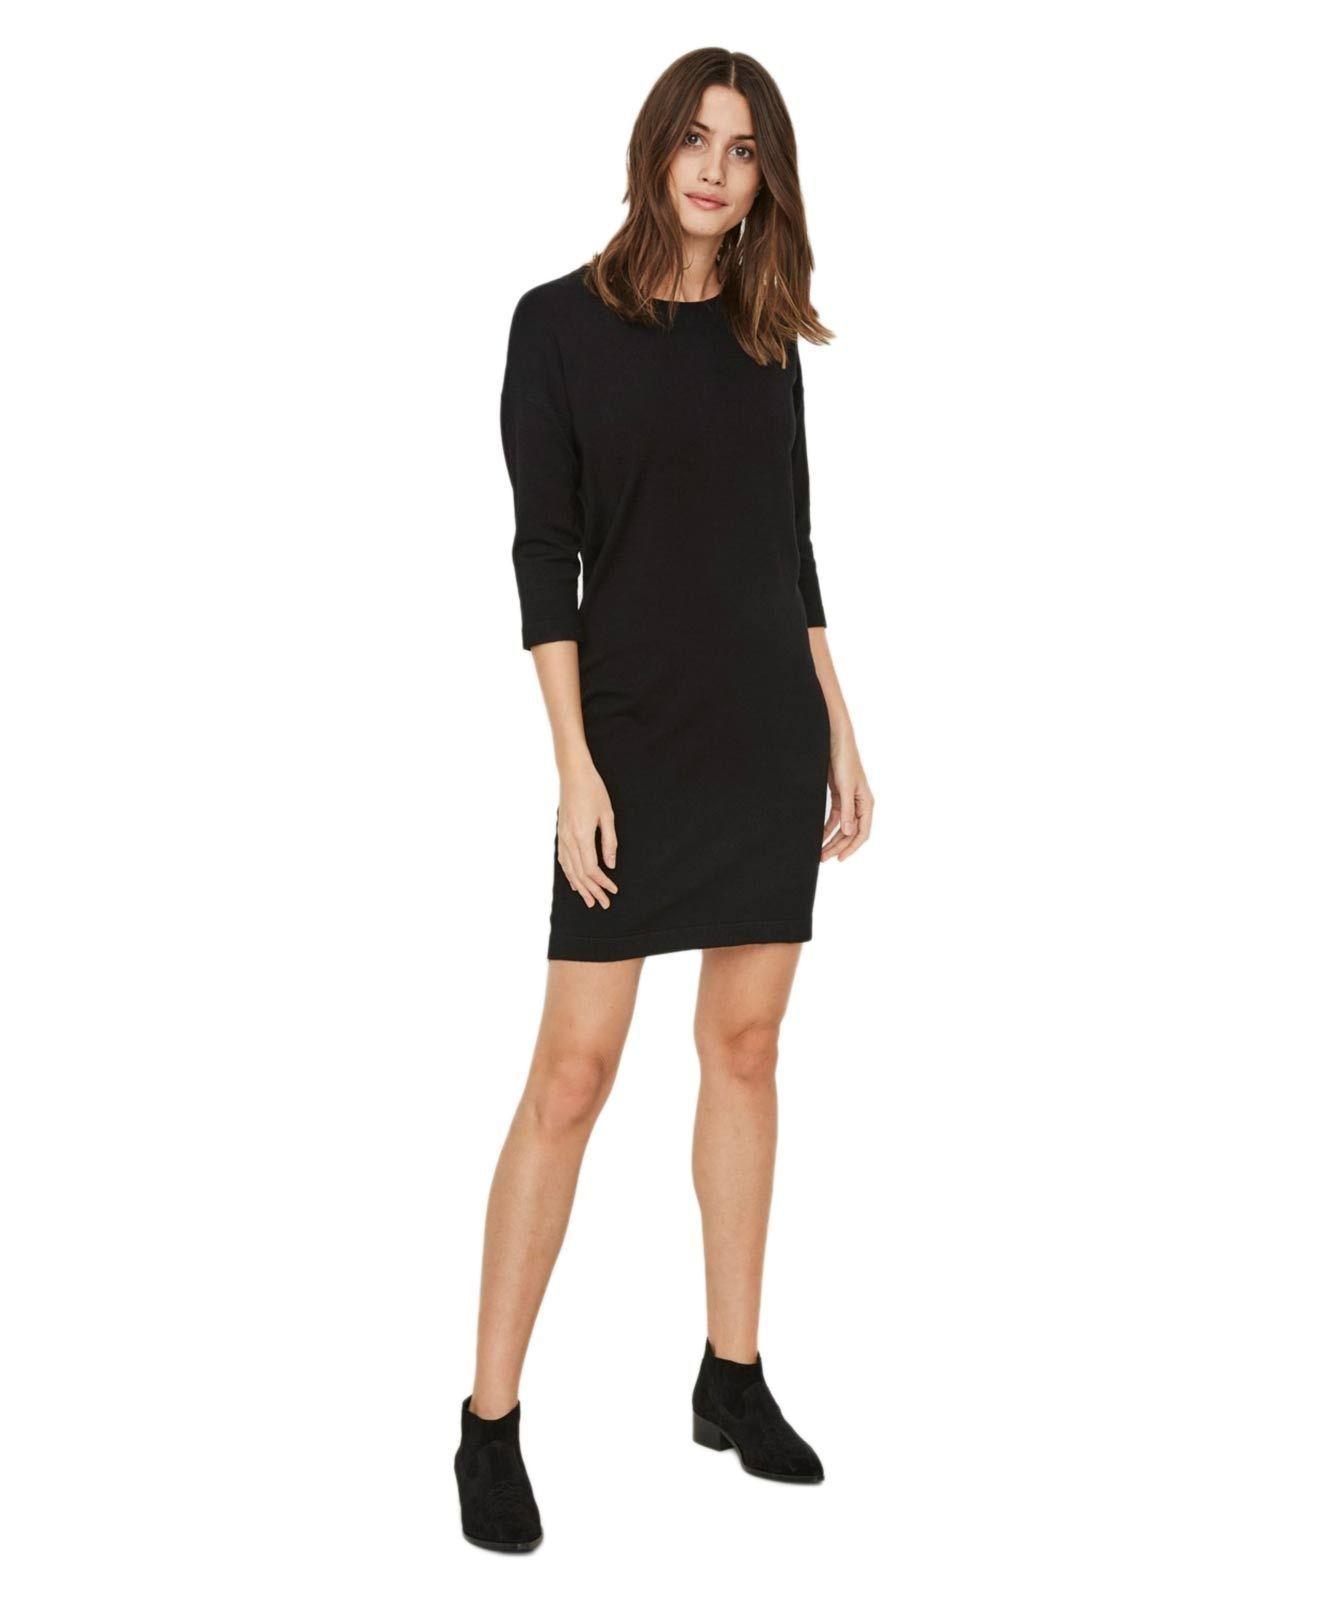 Vero Moda Kleid - Glory Aura - Schwarz - Jeans-Meile ...